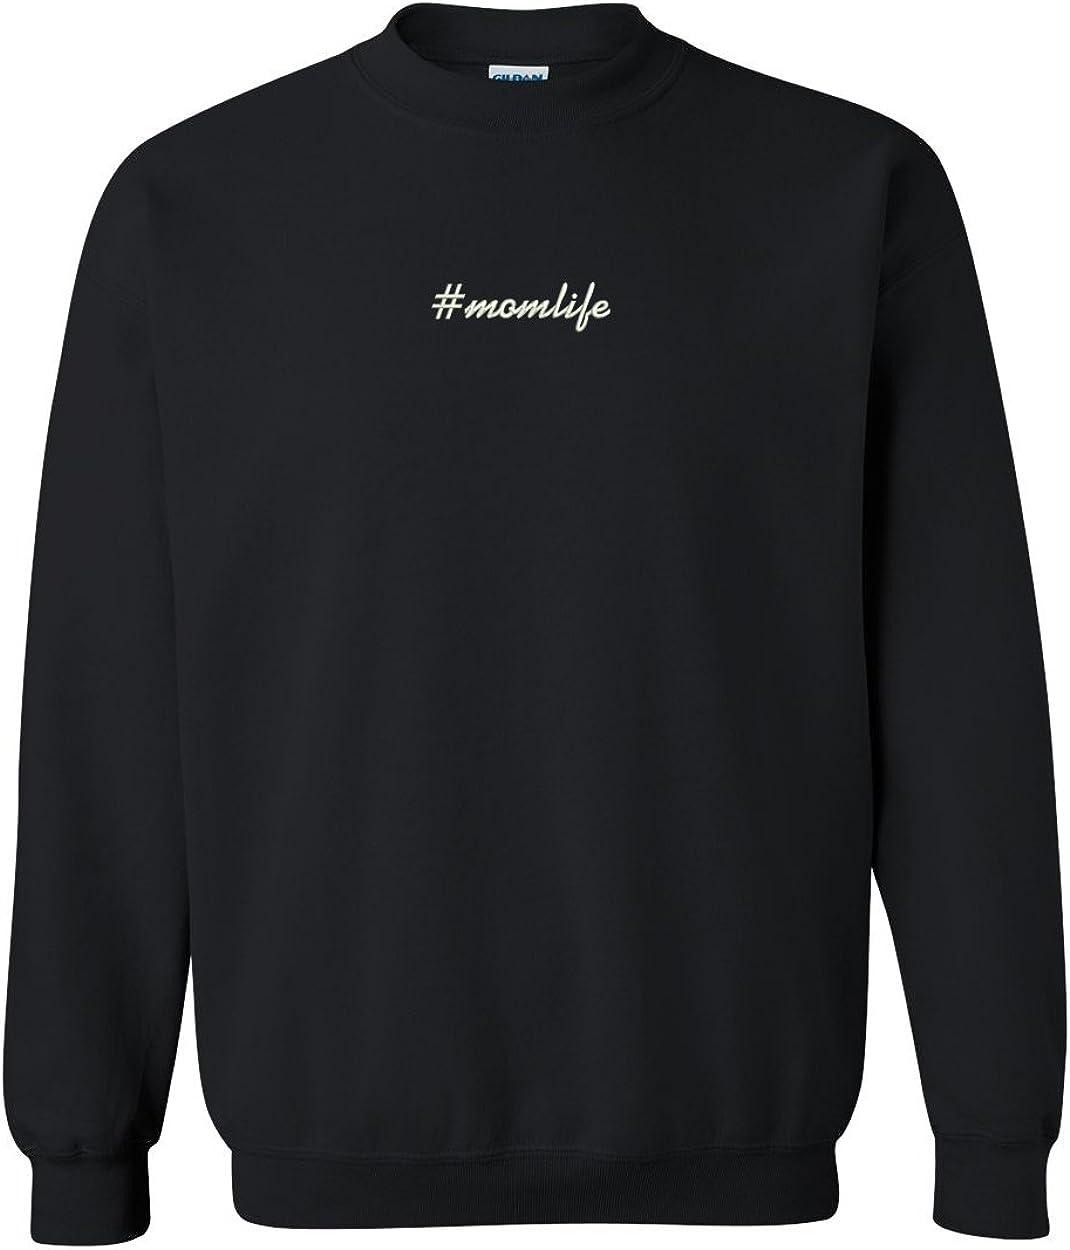 Trendy Apparel Shop Hashtag #Momlife Embroidered Crewneck Sweatshirt